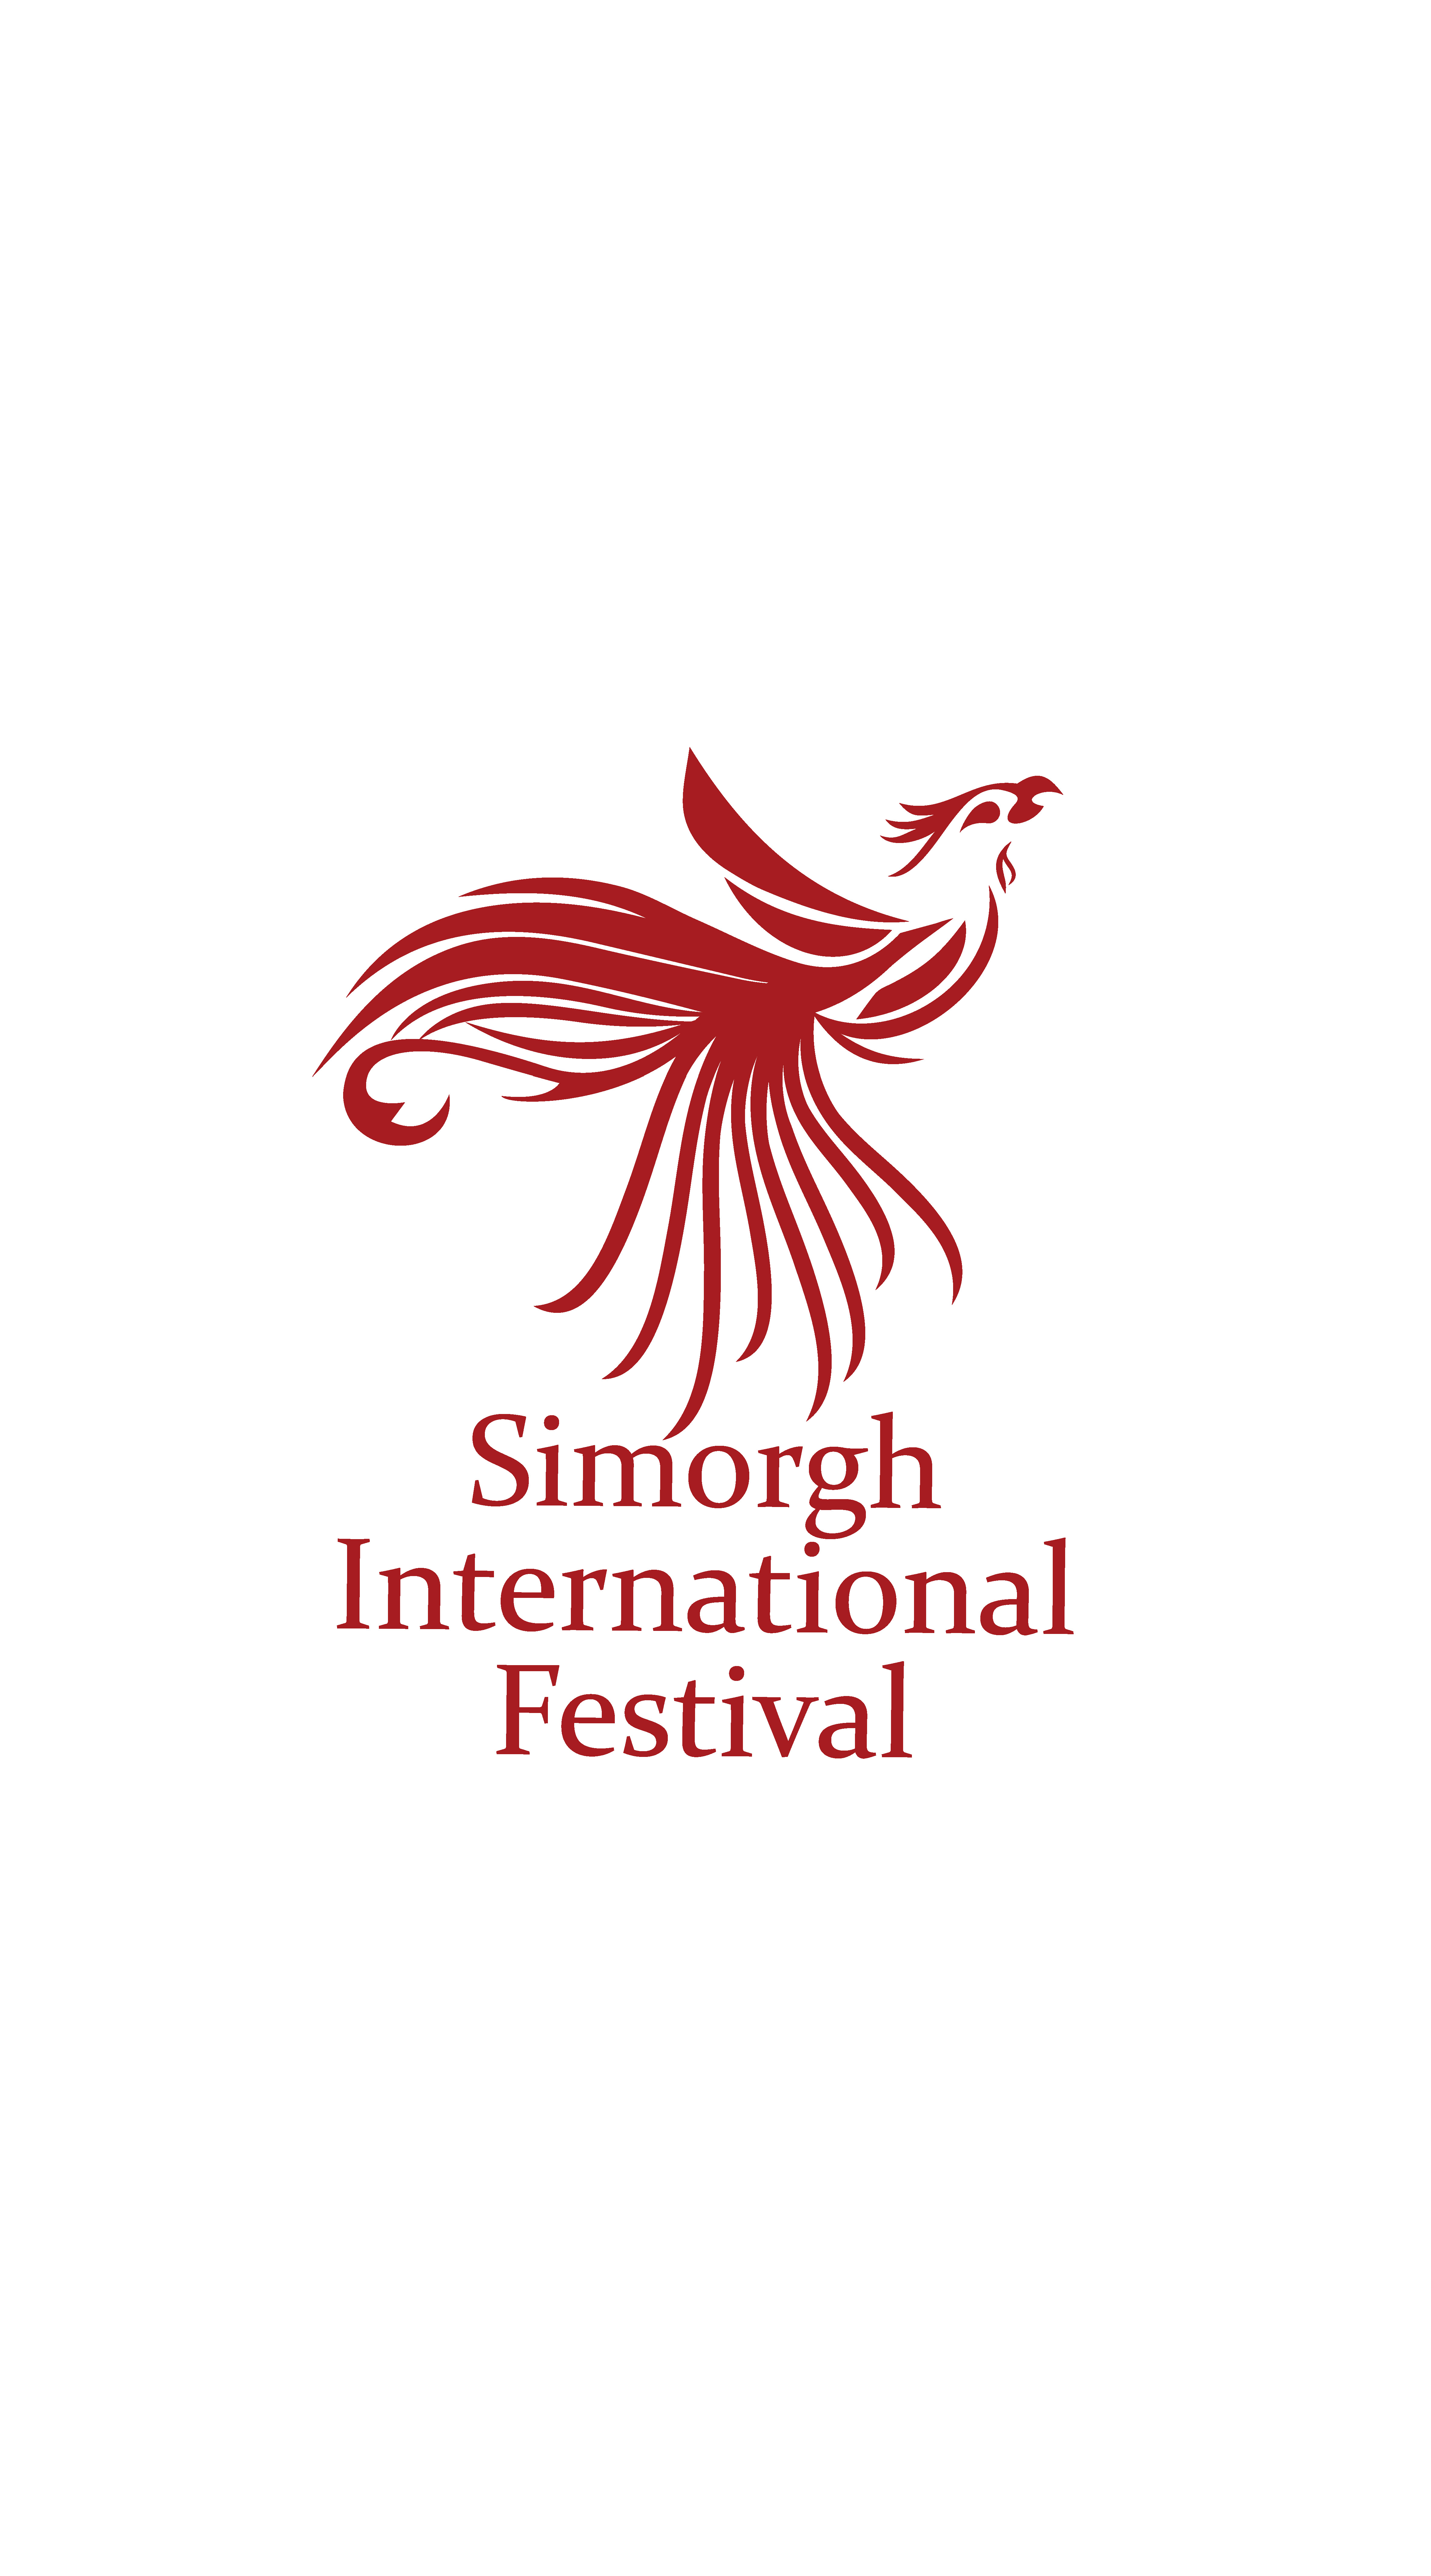 Simorgh International Festival